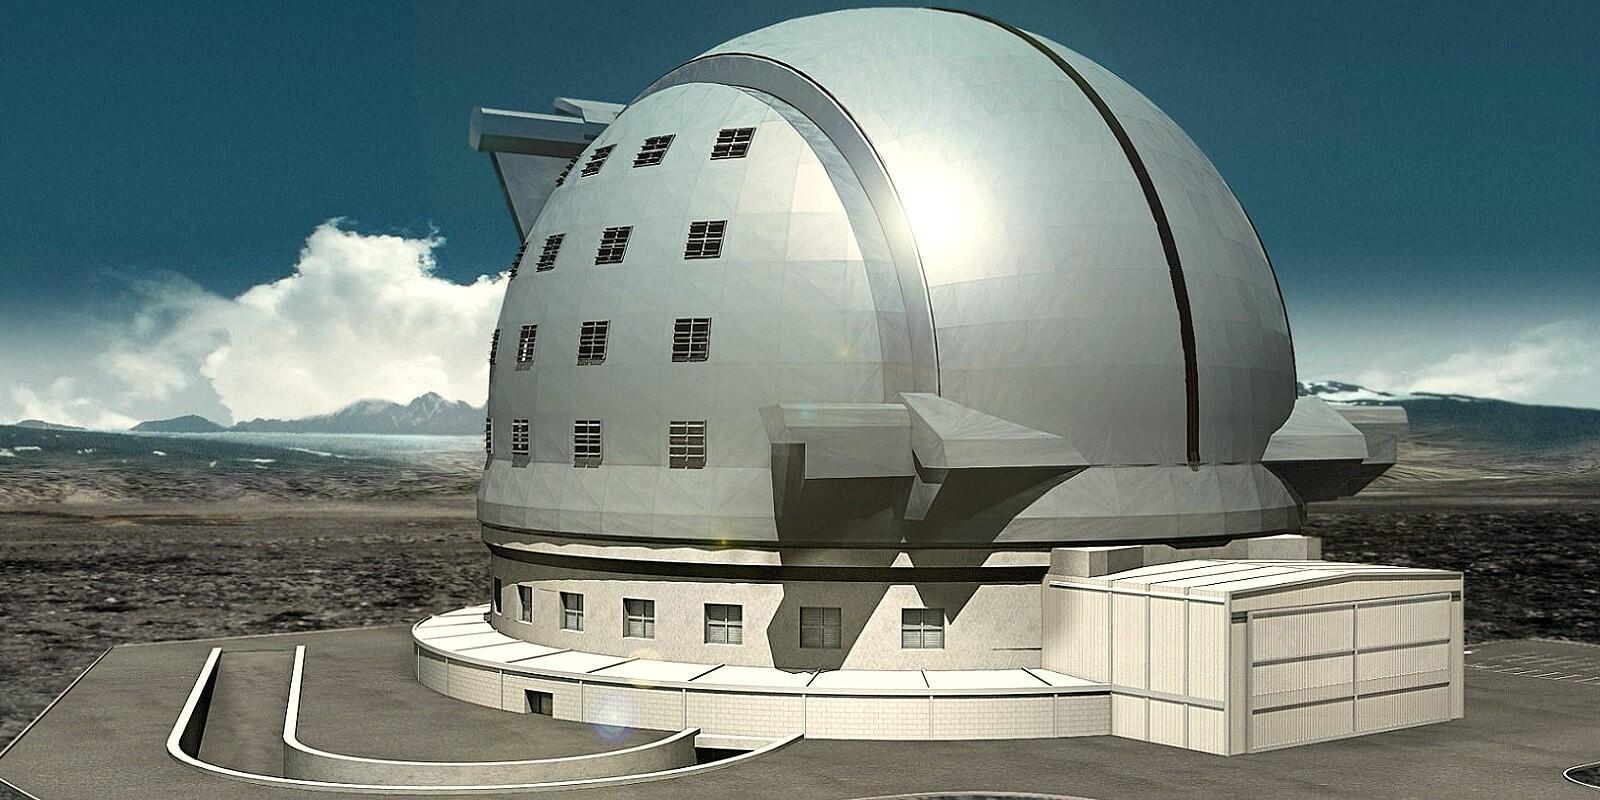 E-ELT_European_Extremely_Large_Telescope_Dome_Astronomy_Chile_IDOM_ADA_11_